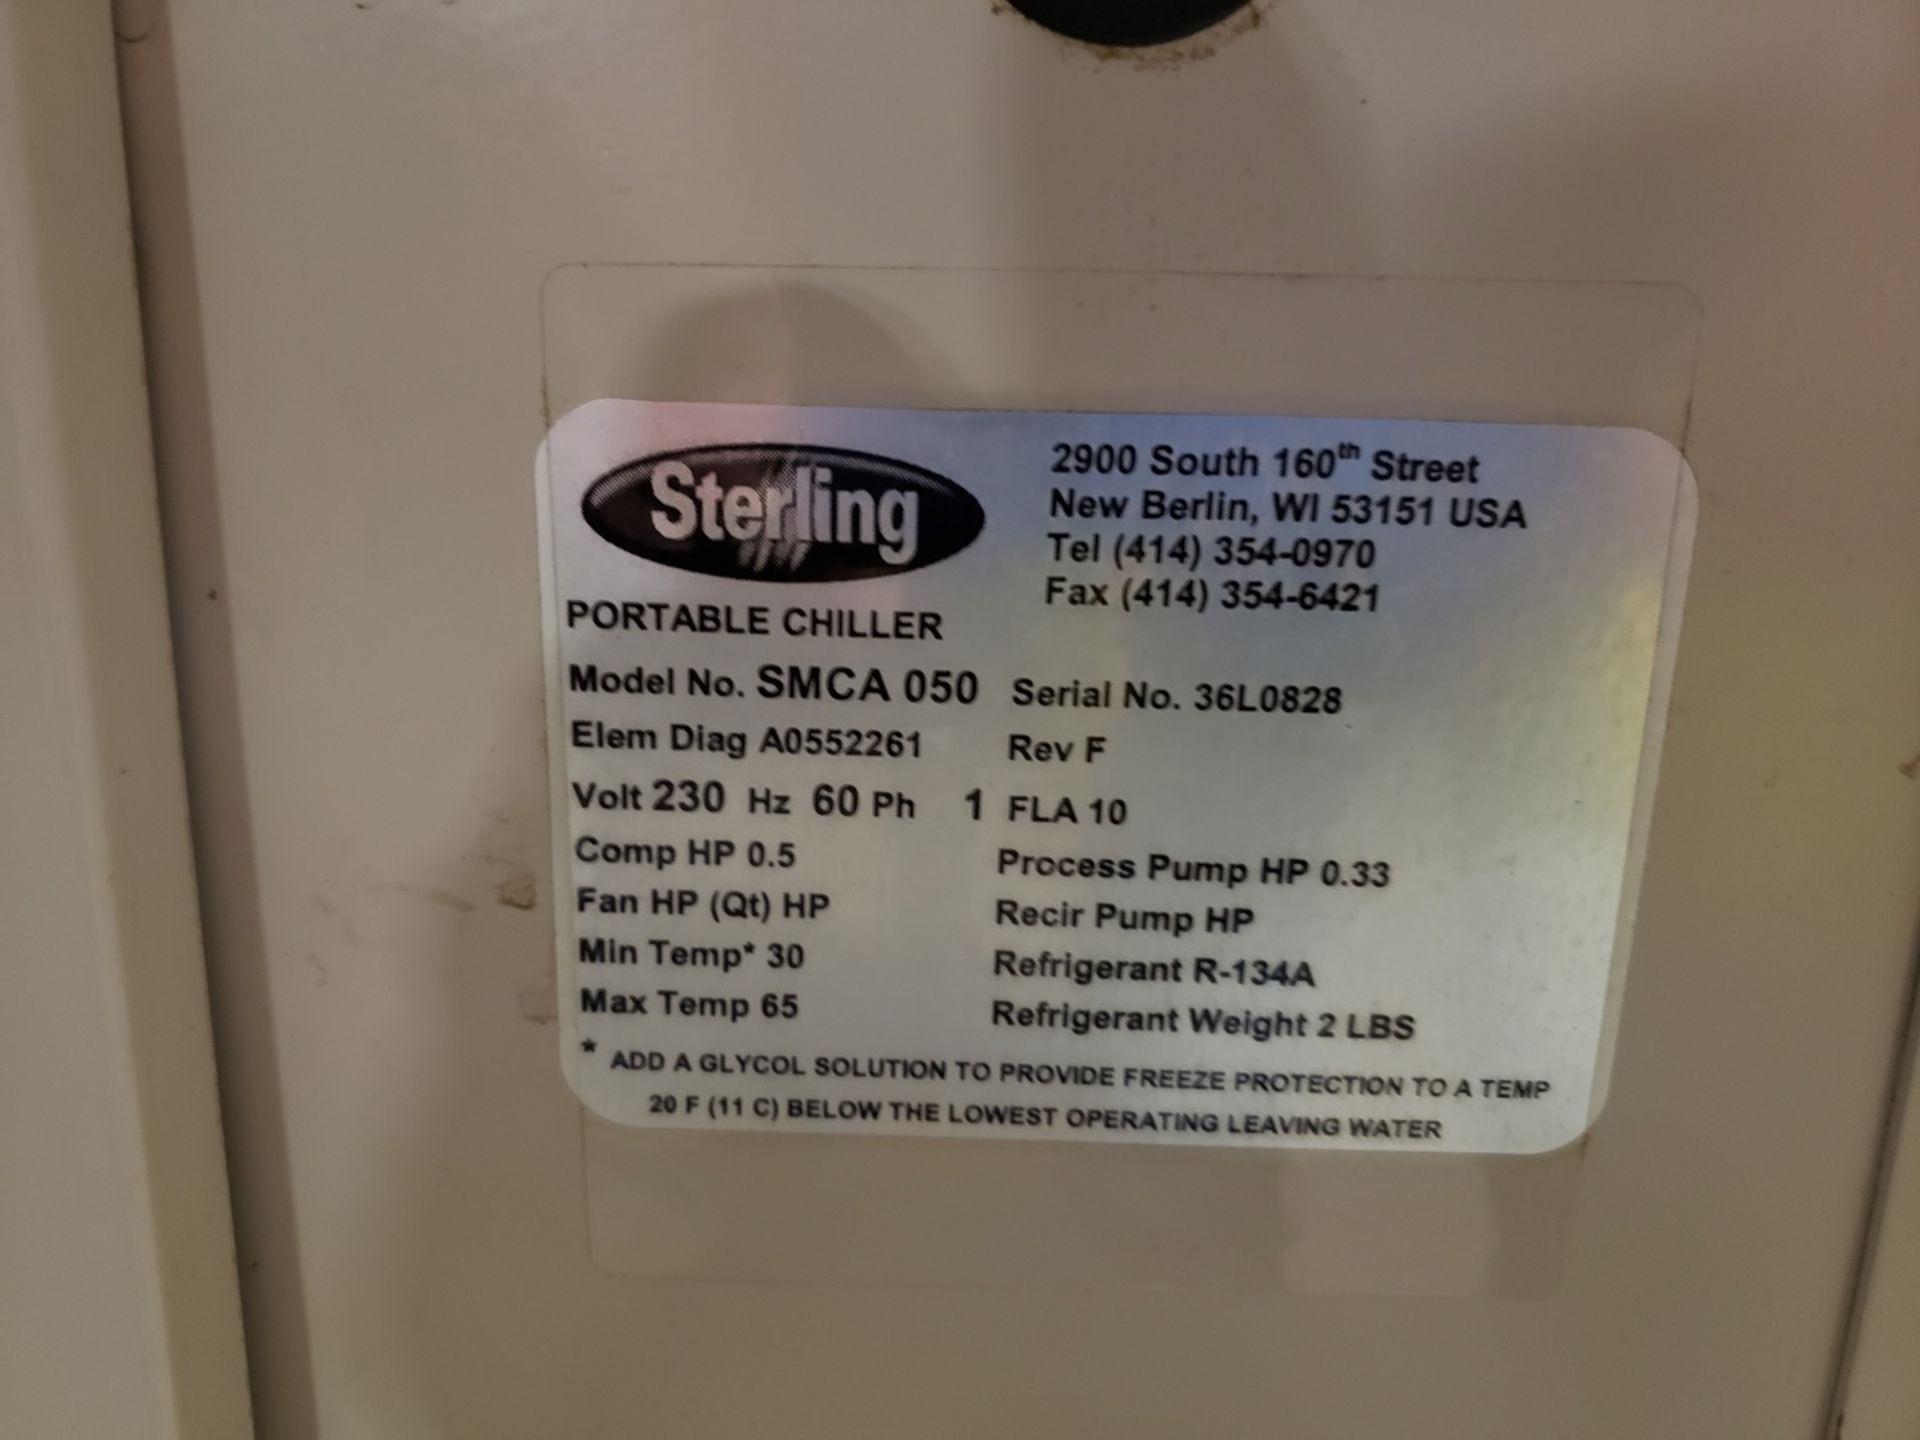 Lot 2B - Sterling Water Chiller, M# SMCA 050, S/N 36L0828